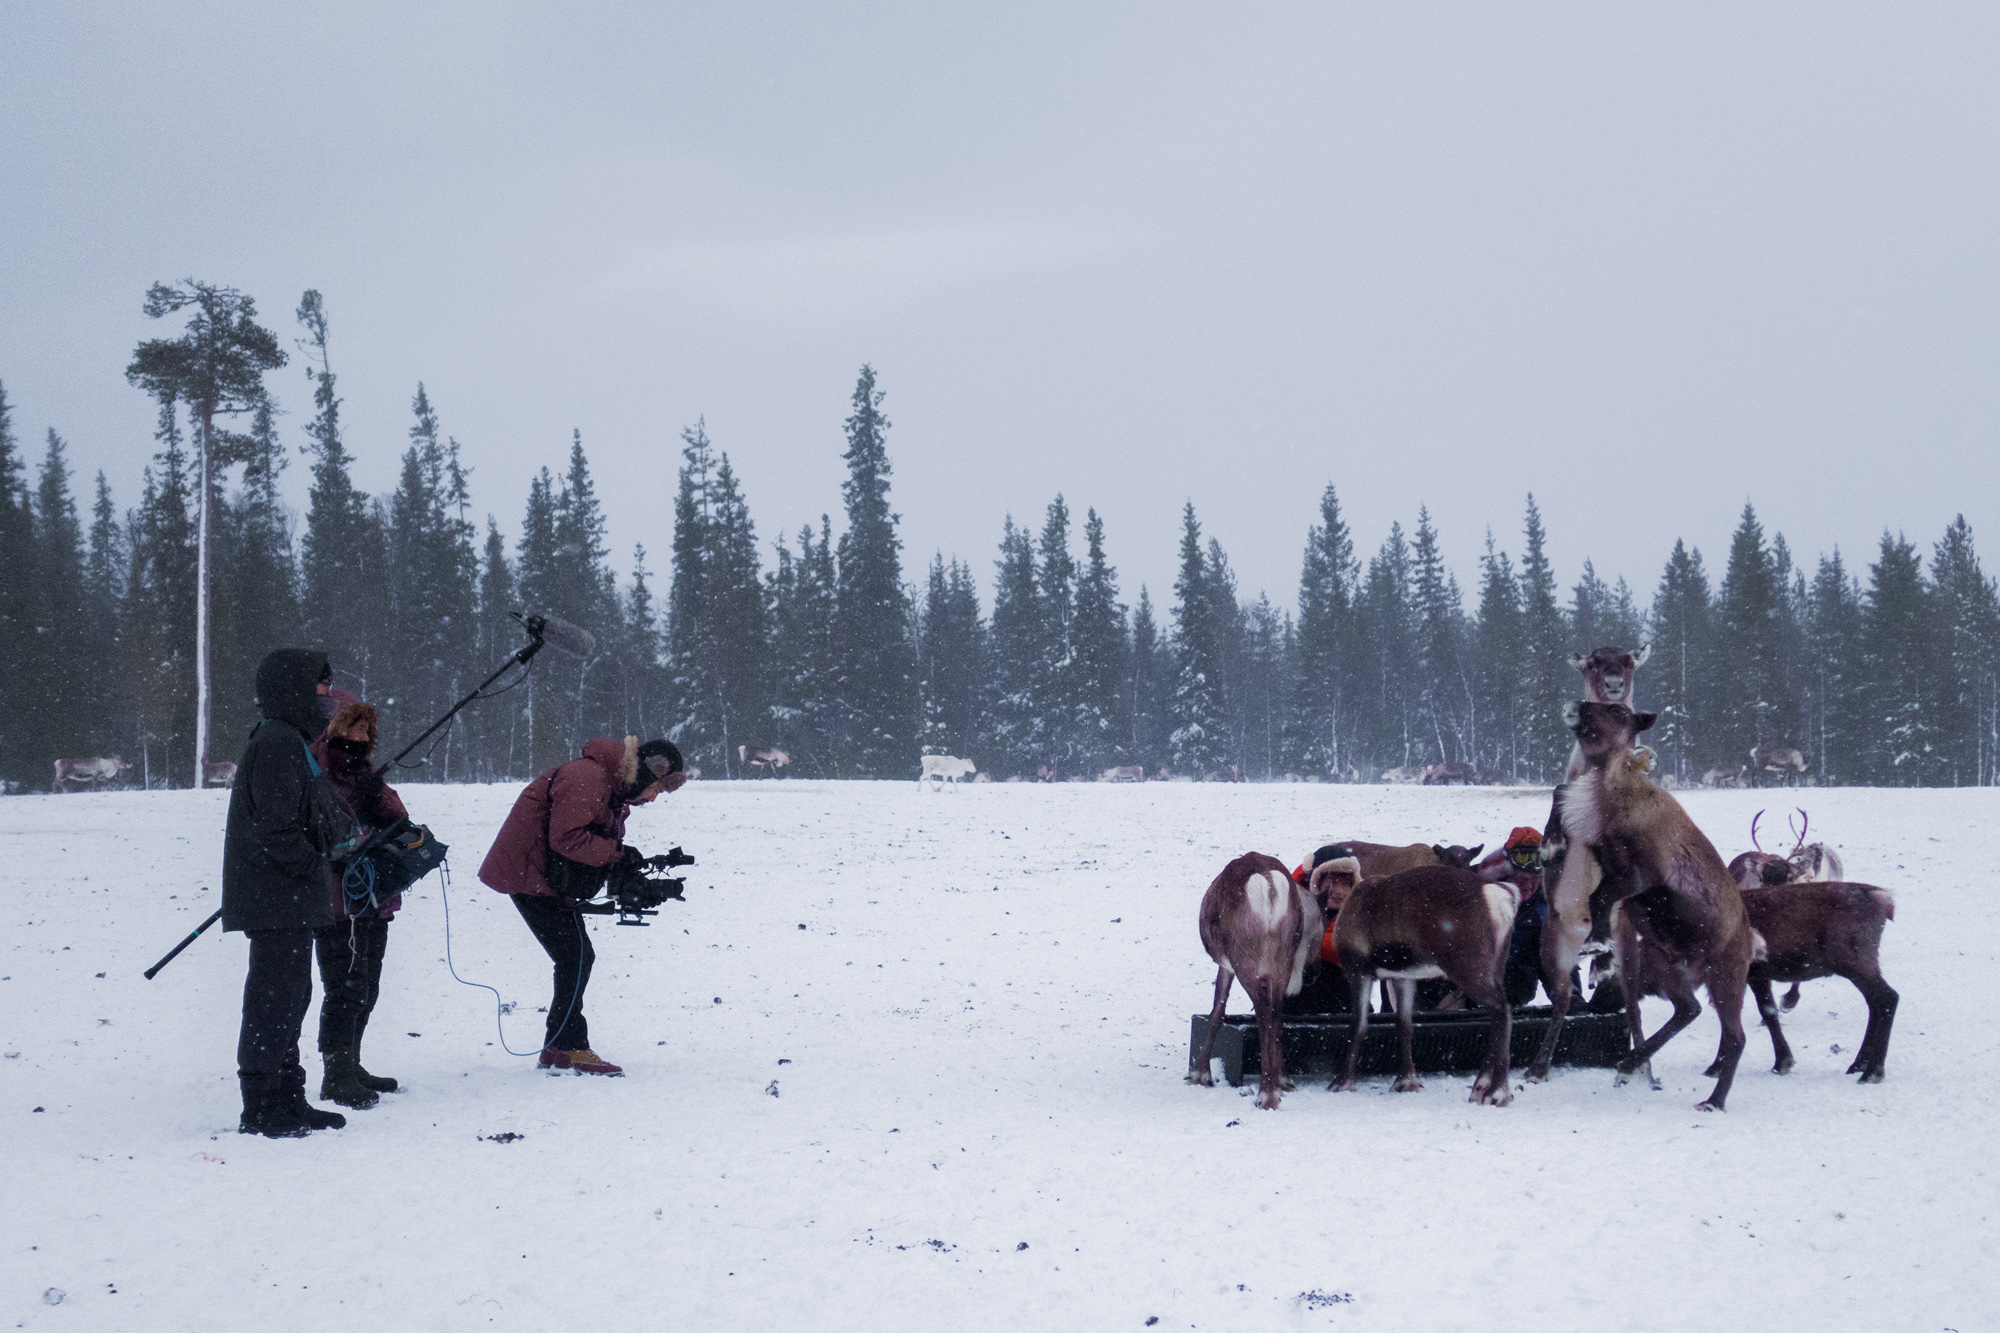 Feeding the reindeer. トナカイにエサあげましょう。